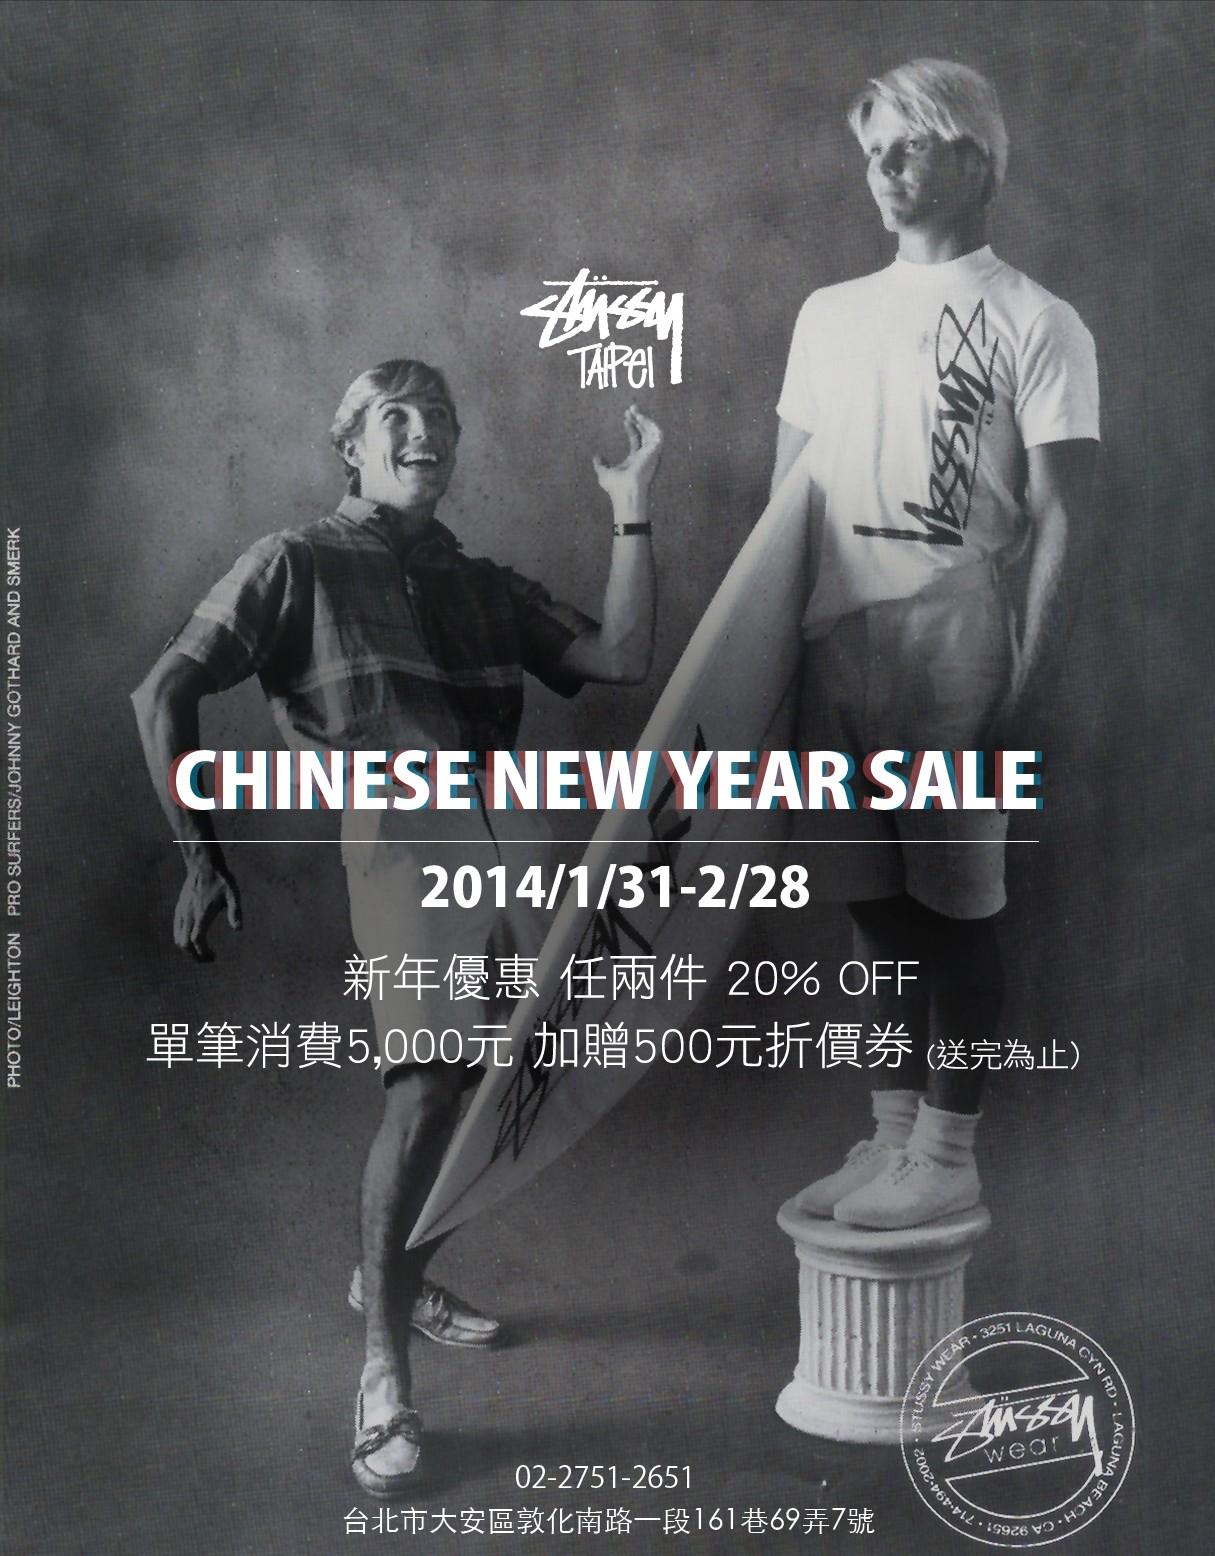 Stussy Taipei CHINESE NEW YEAR SALE 新年折扣 – OVERDOPE 華人首席線上時尚潮流雜誌